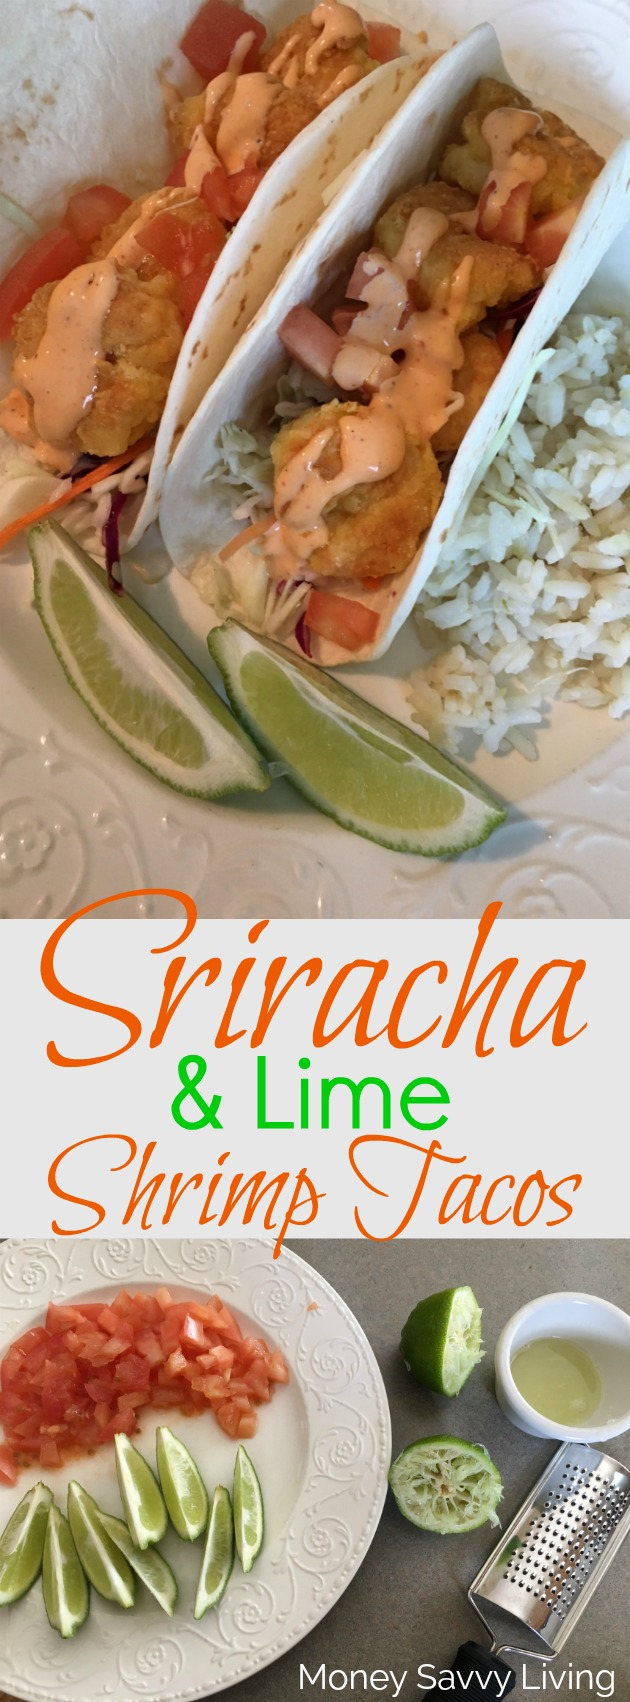 Sriracha Shrimp Tacos // Money Savvy Living